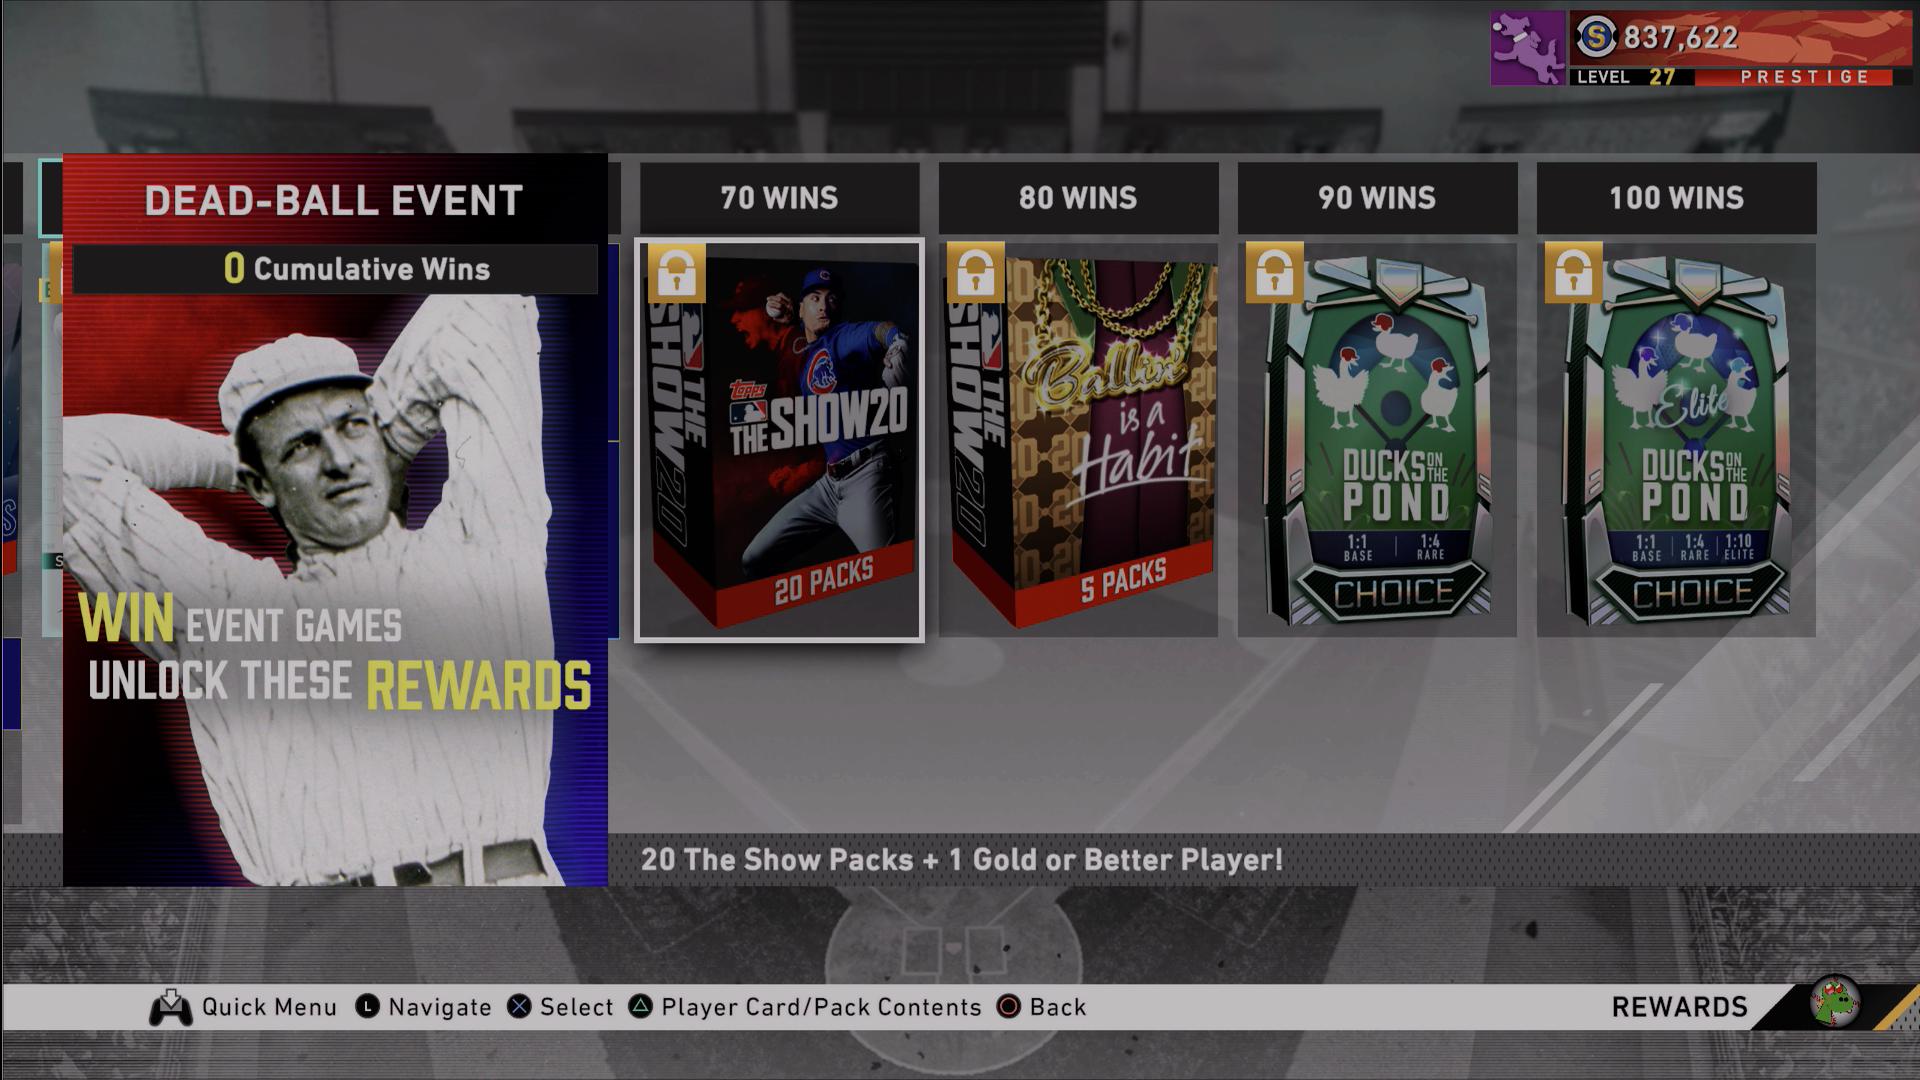 dead-ball event rewards